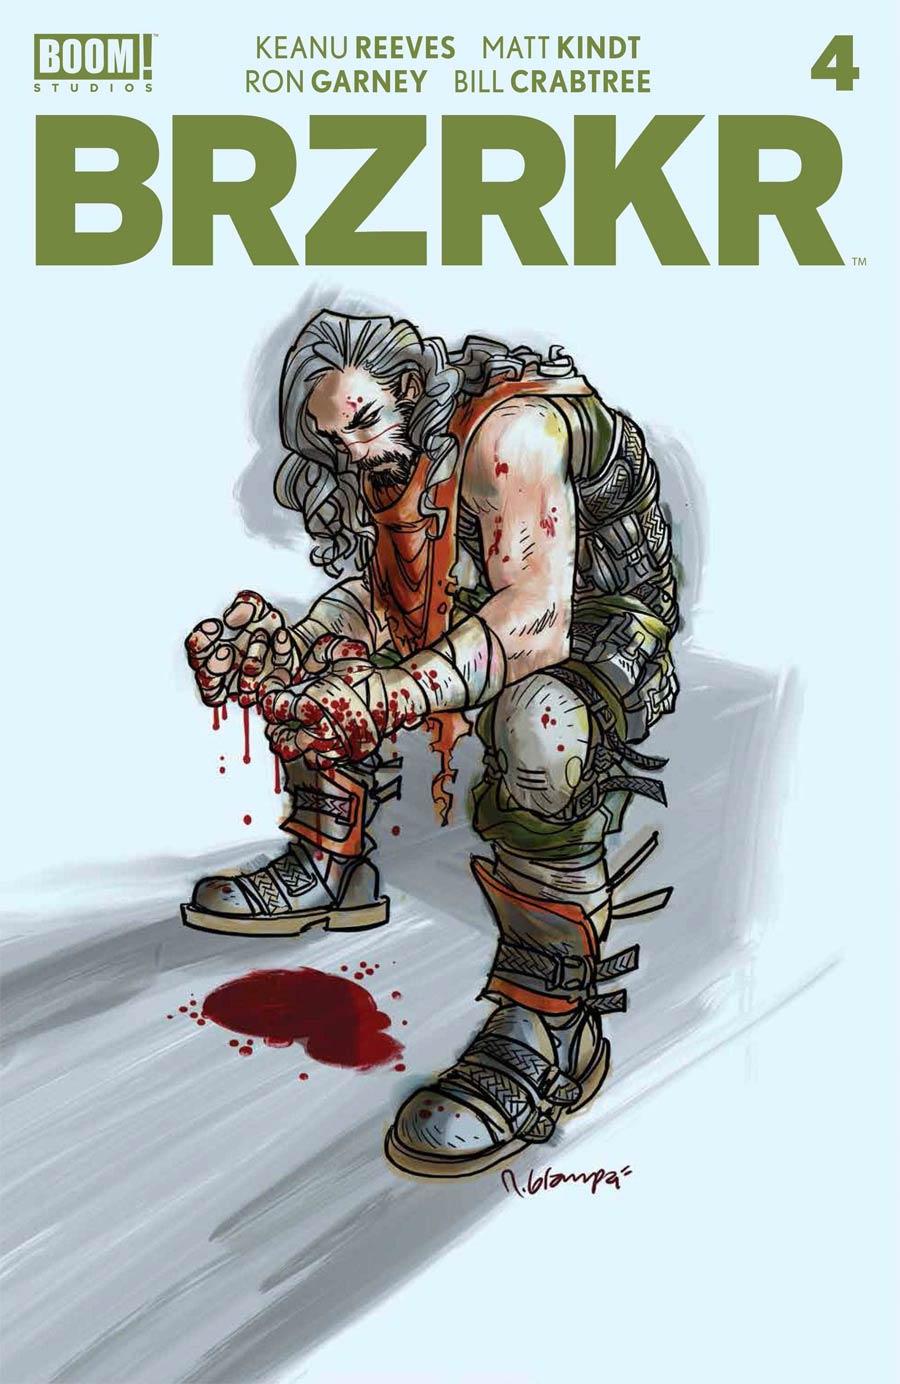 BRZRKR (Berzerker) #4 Cover C Variant Rafael Grampa Foil Cover